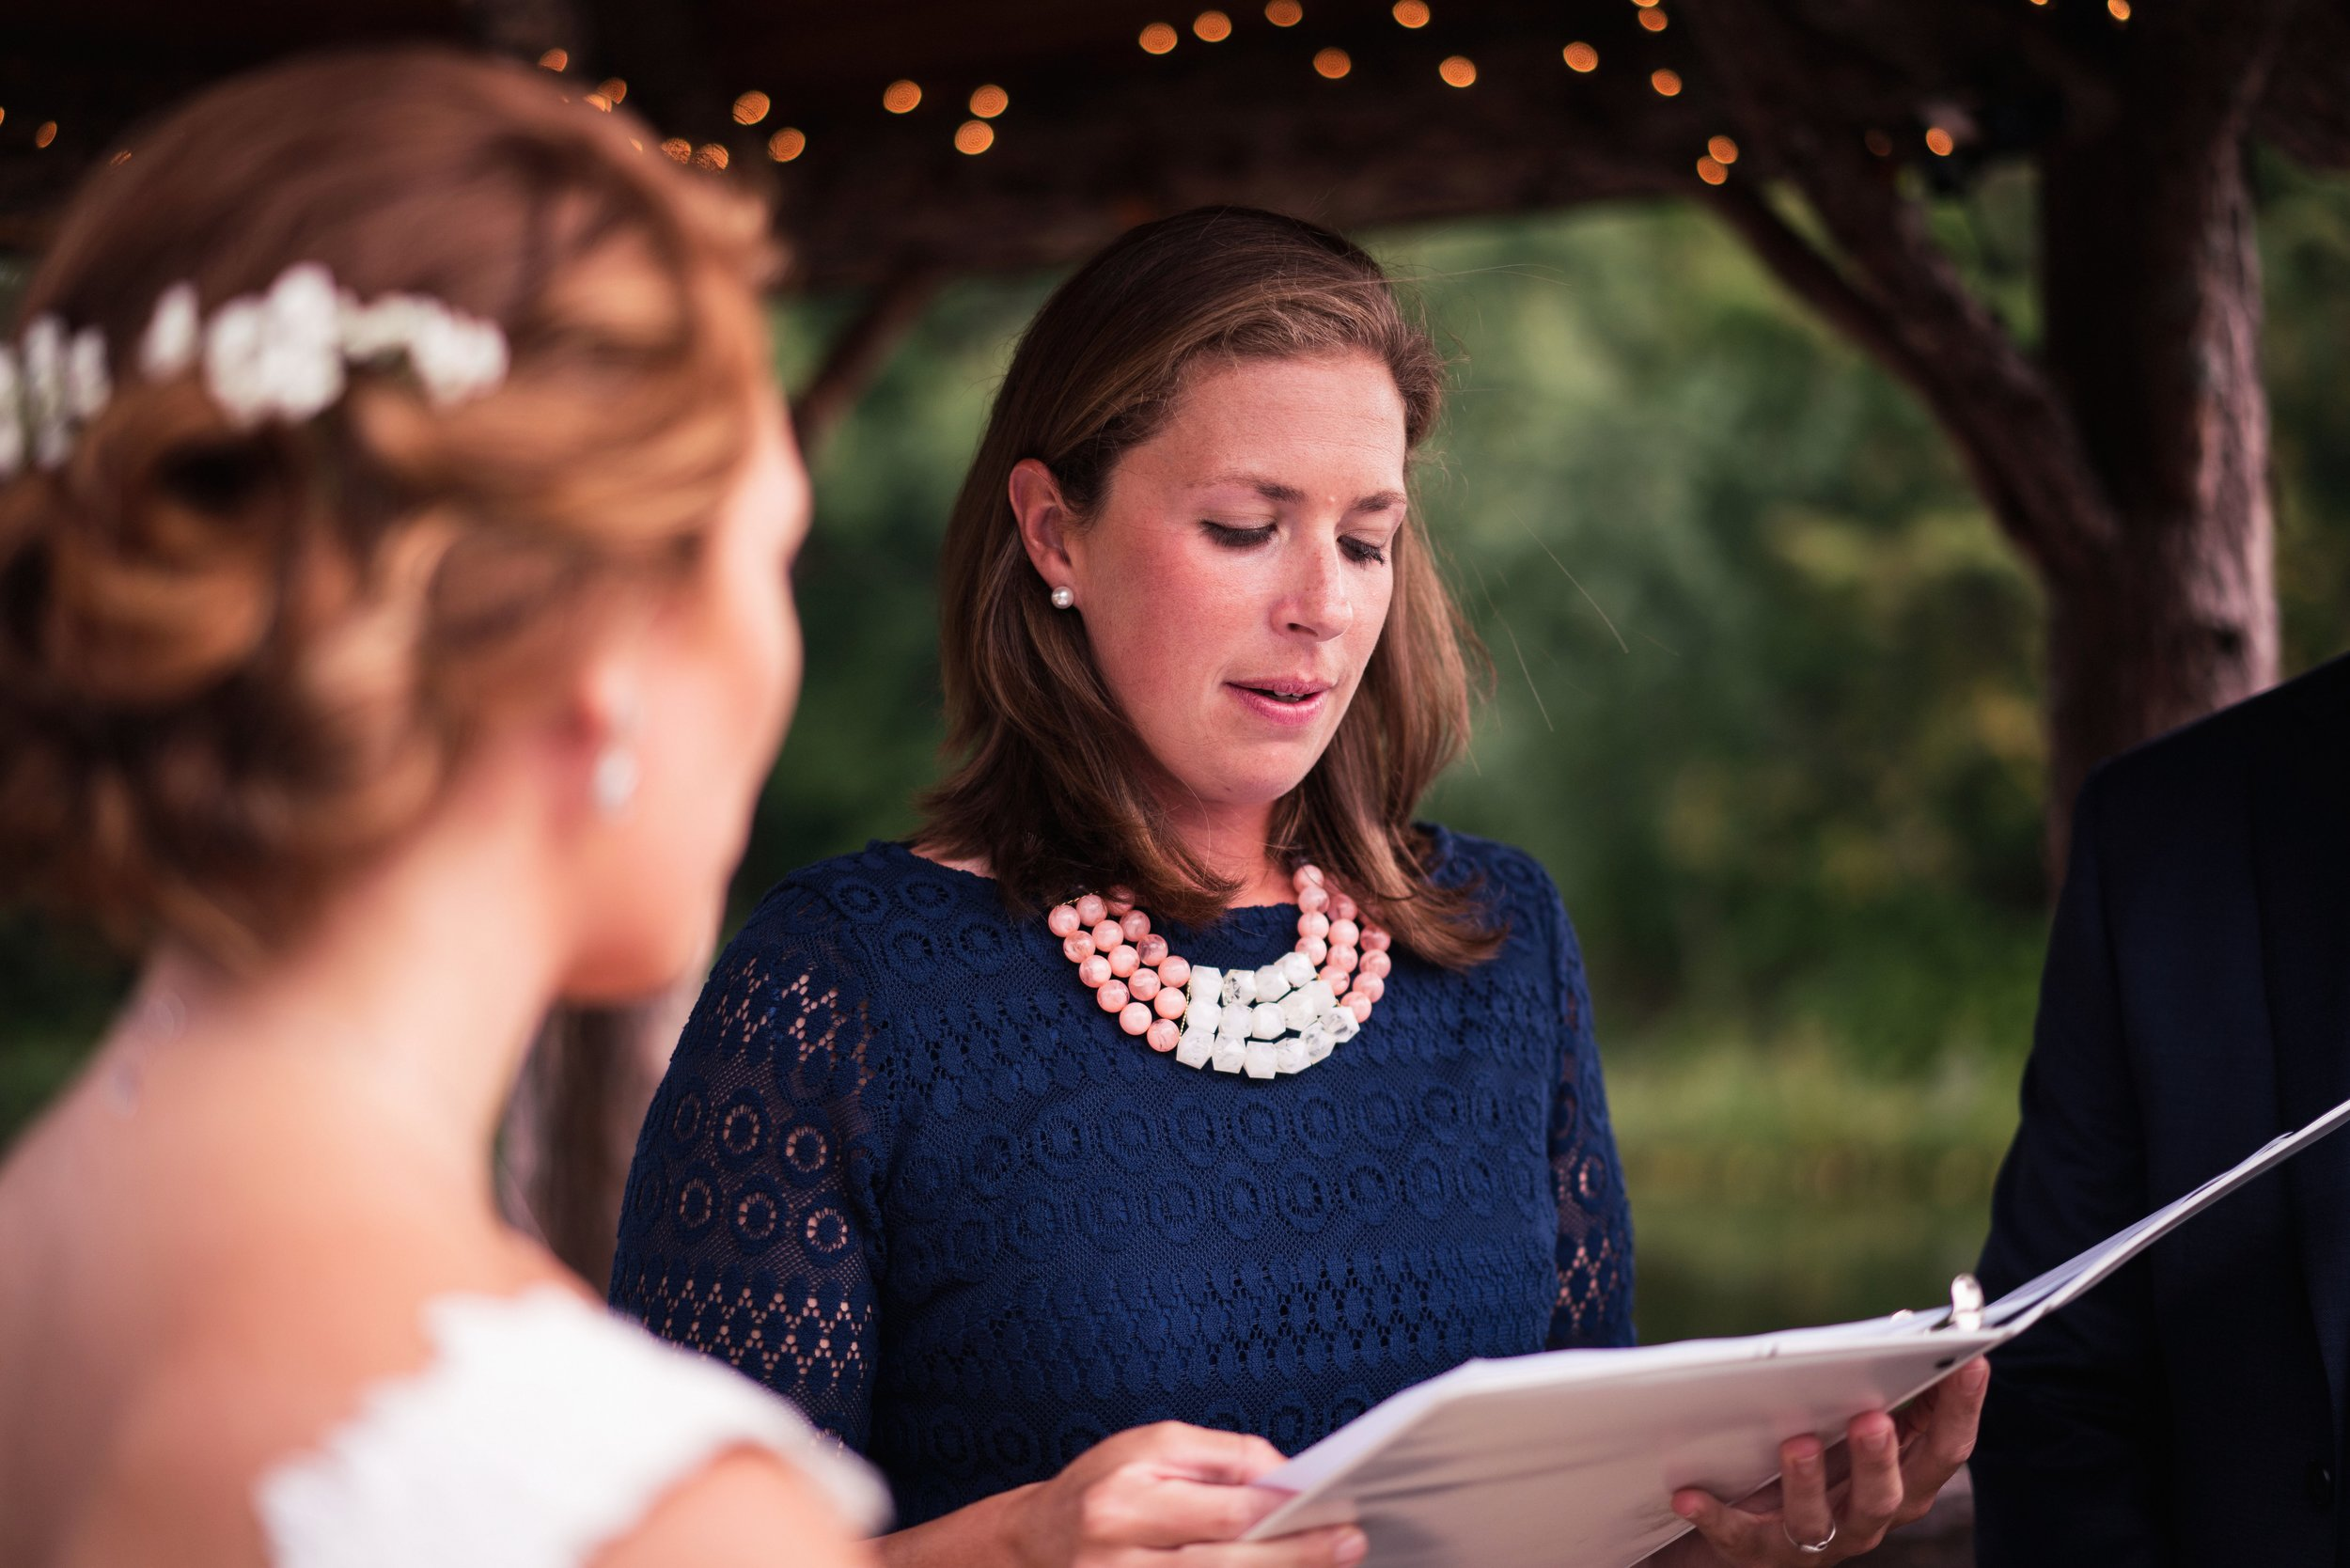 Blog-Lisa-James-Wedding-at Rosebud Estate Weddings in Arcade NY by Stefan-Ludwig-Photography-Buffalo-NY-41-x.jpg